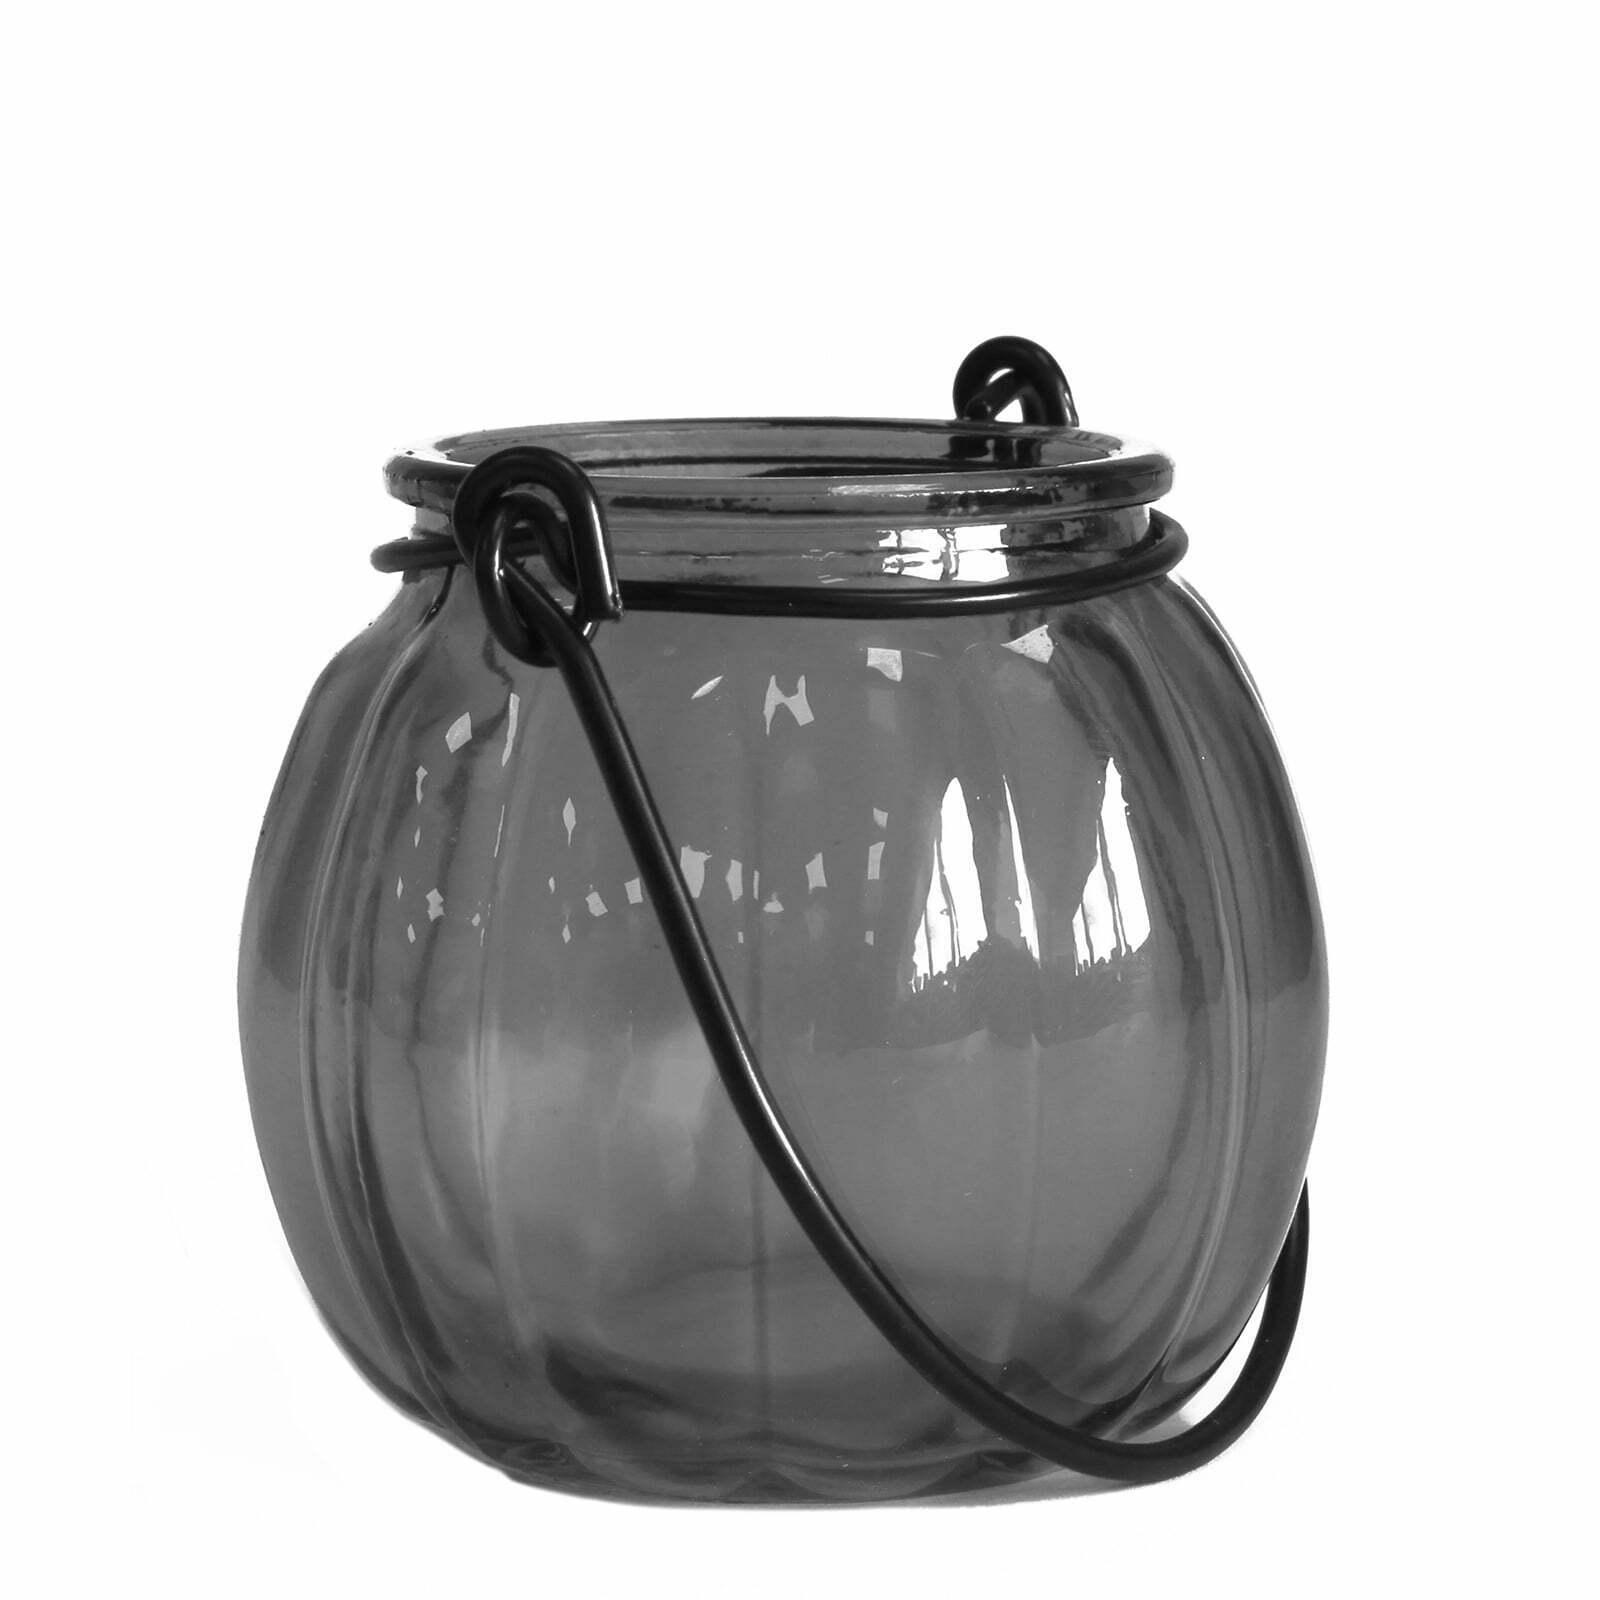 Lanterna para velas vidro reciclado abóbora – Cinza